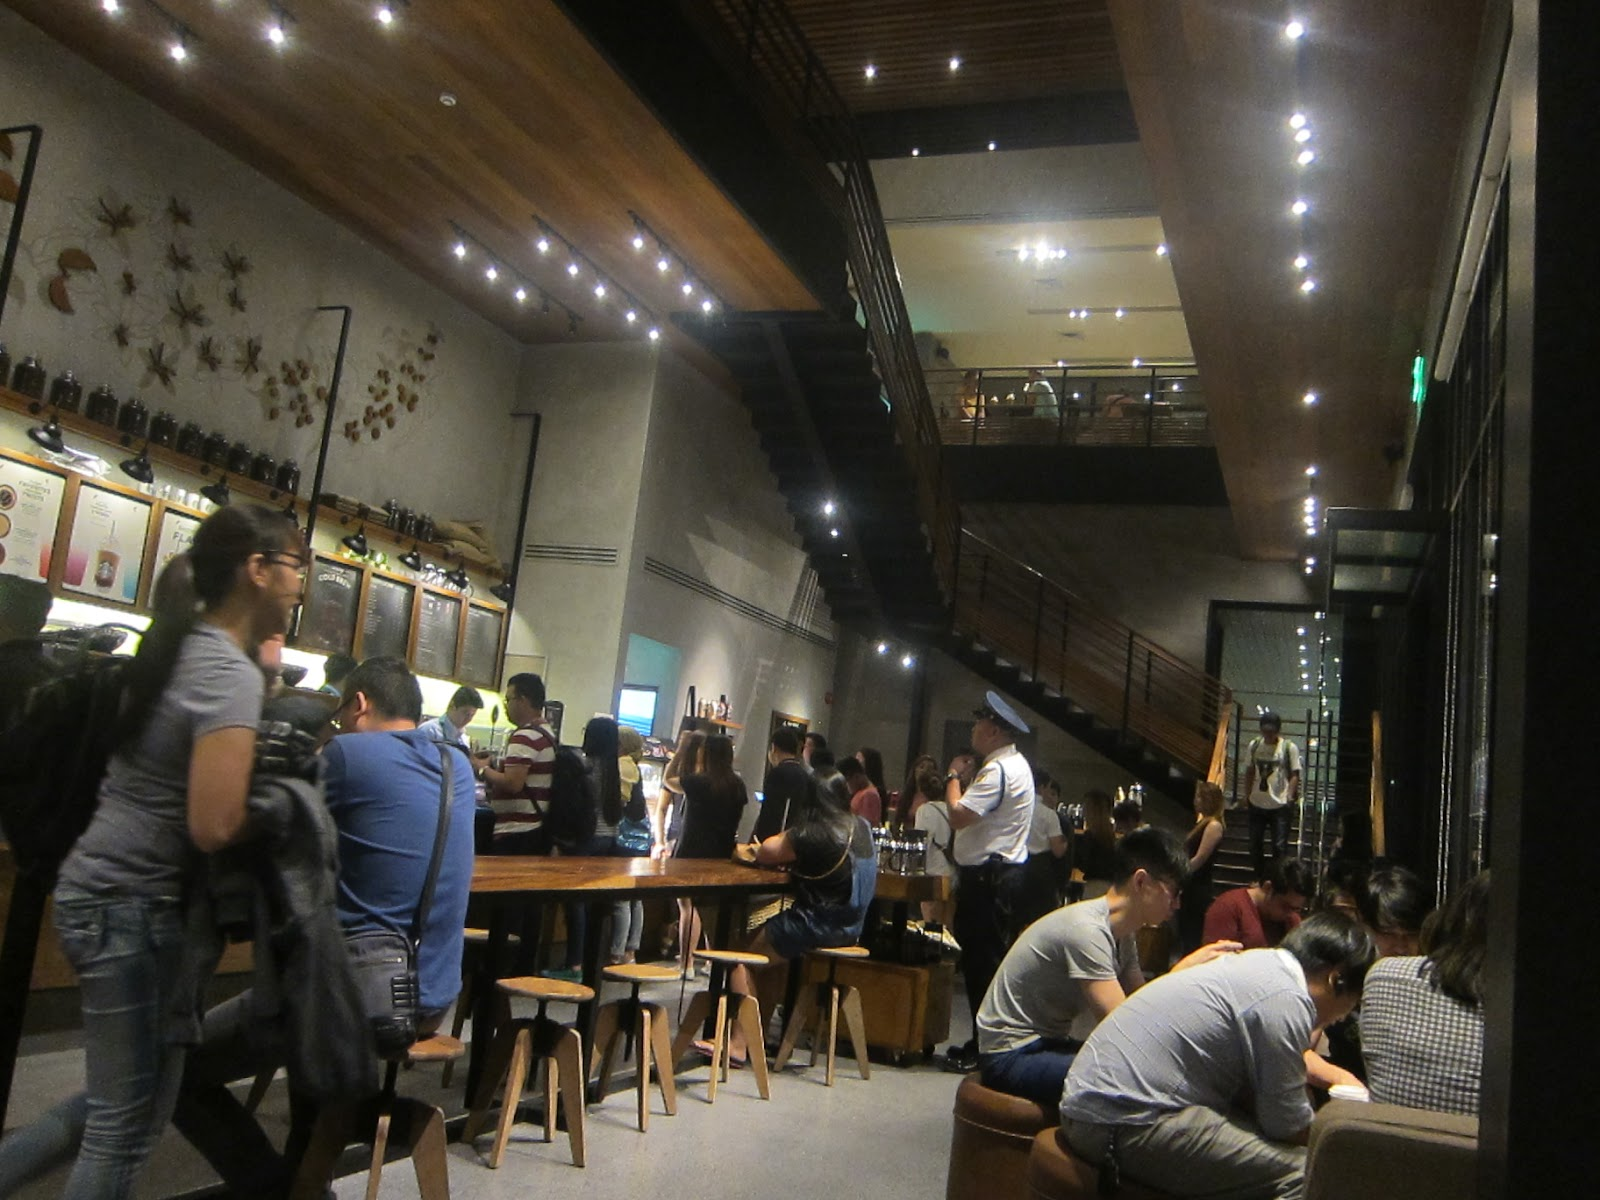 Starbucks Marketing Analysis Along the&nbspResearch Proposal